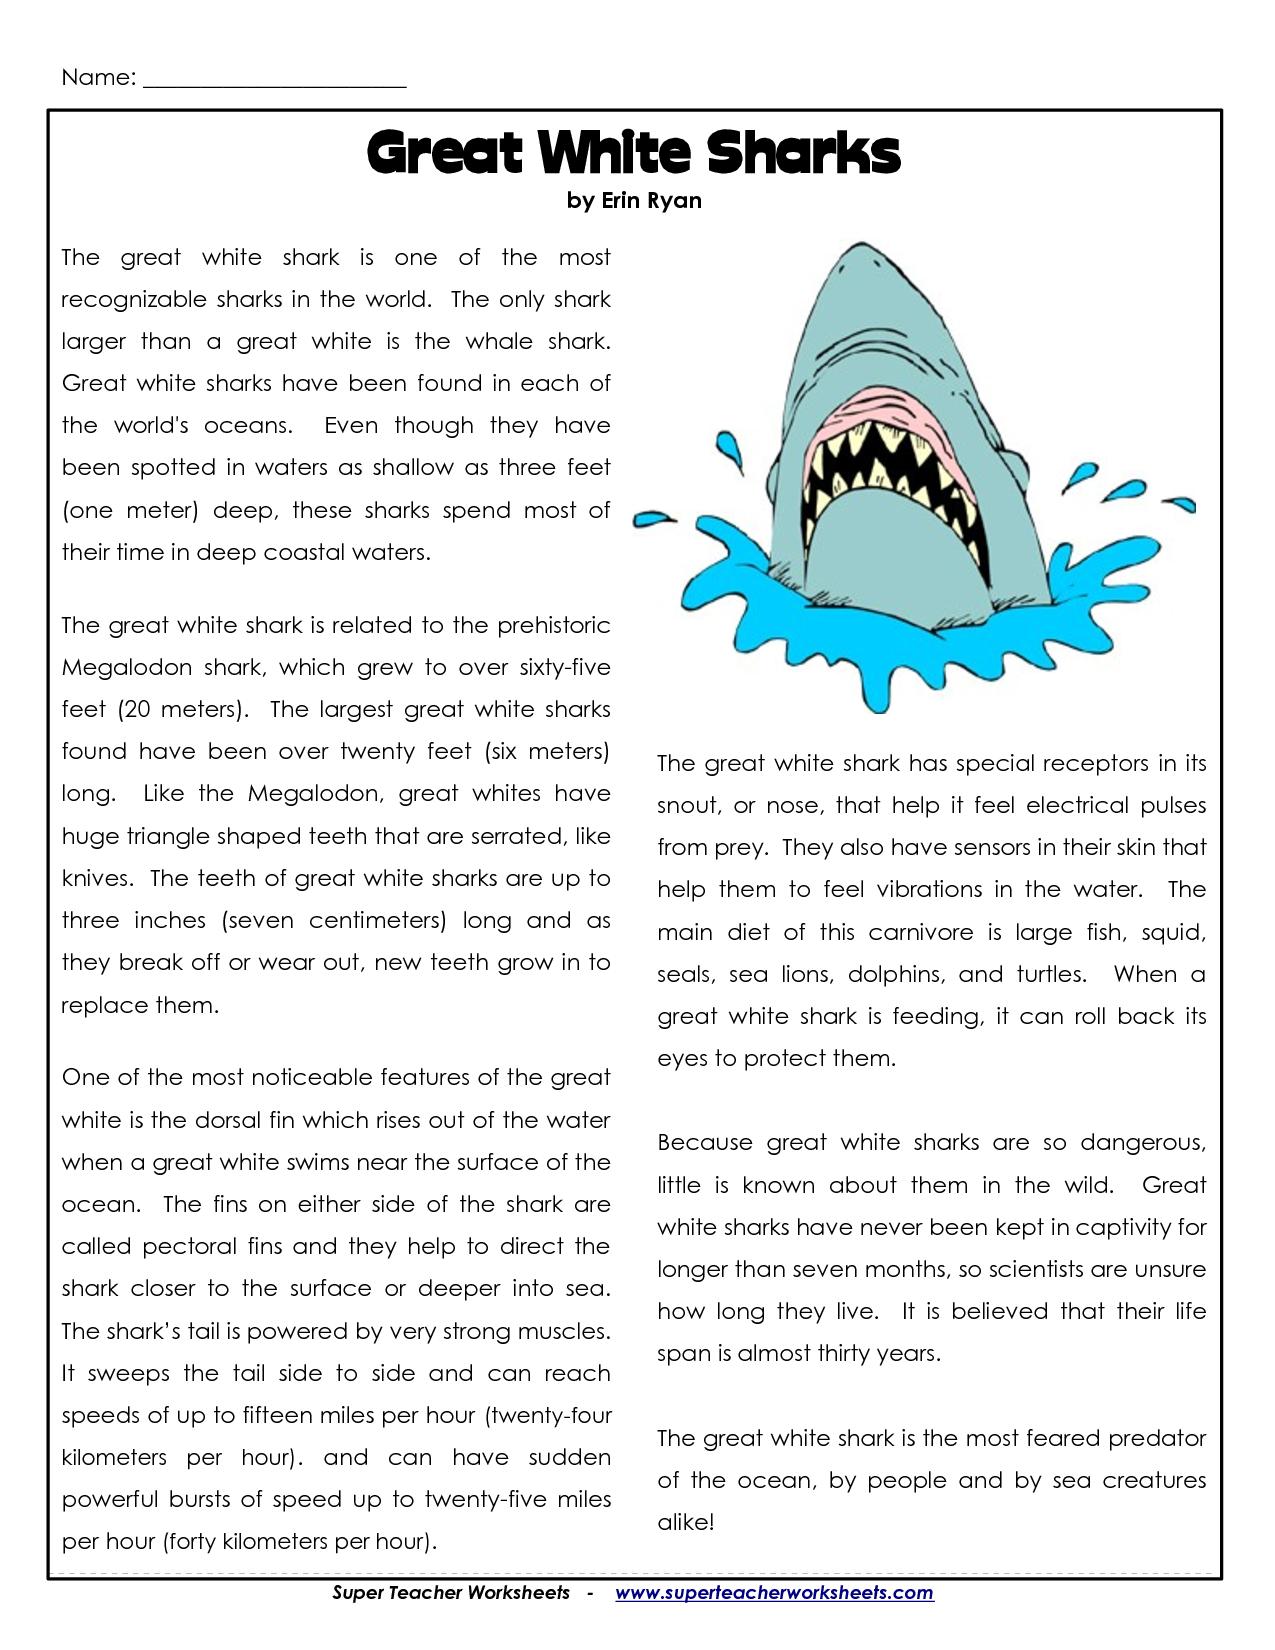 Shark Science Worksheets Science Worksheets Free Science Worksheets Learning Websites [ 1650 x 1275 Pixel ]